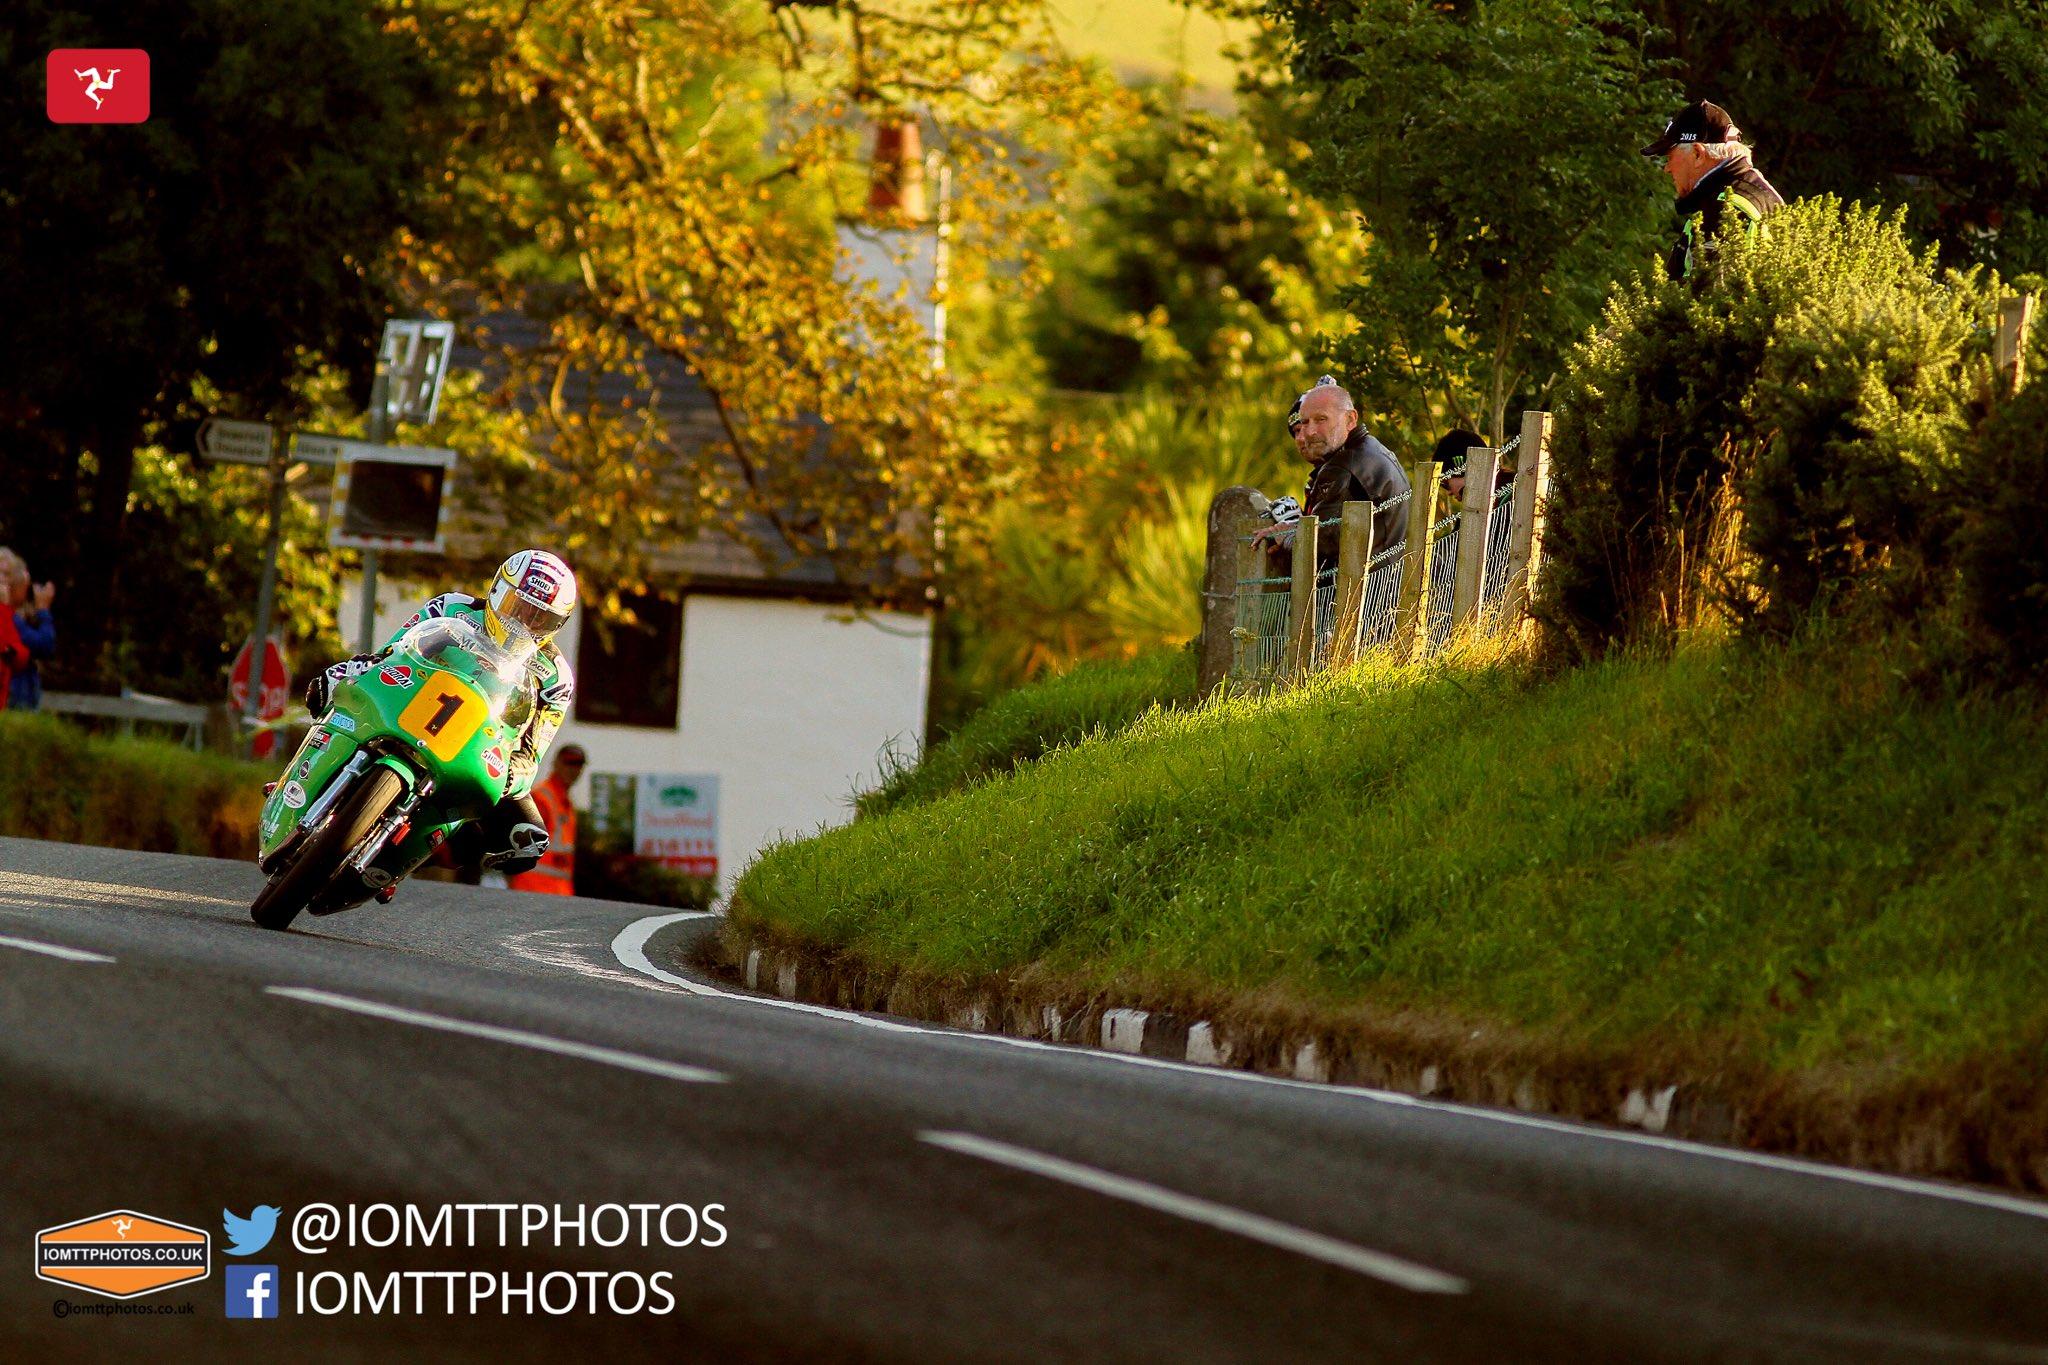 [Road Racing] CLASSIC TT ET MANX GRAND PRIX 2016 Cq0cNg0XYAEHLc8